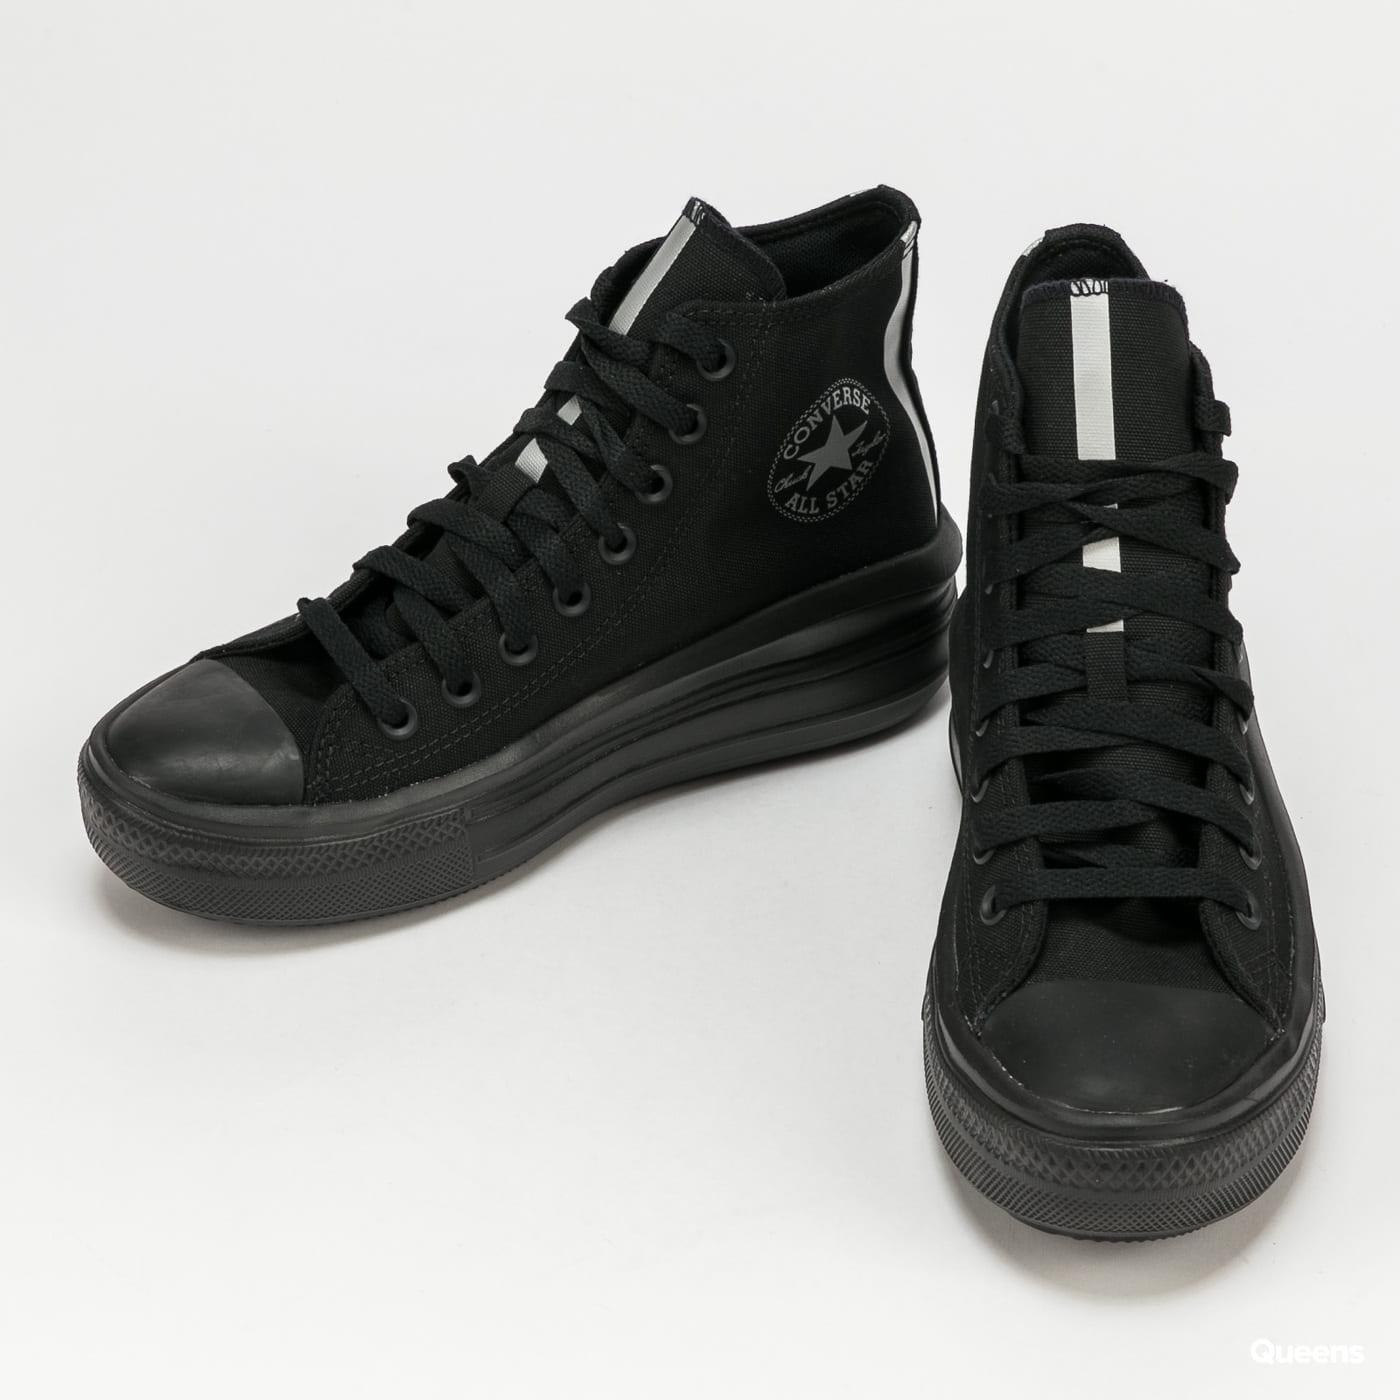 Converse Chuck Taylor All Star Move Hi black / white / black